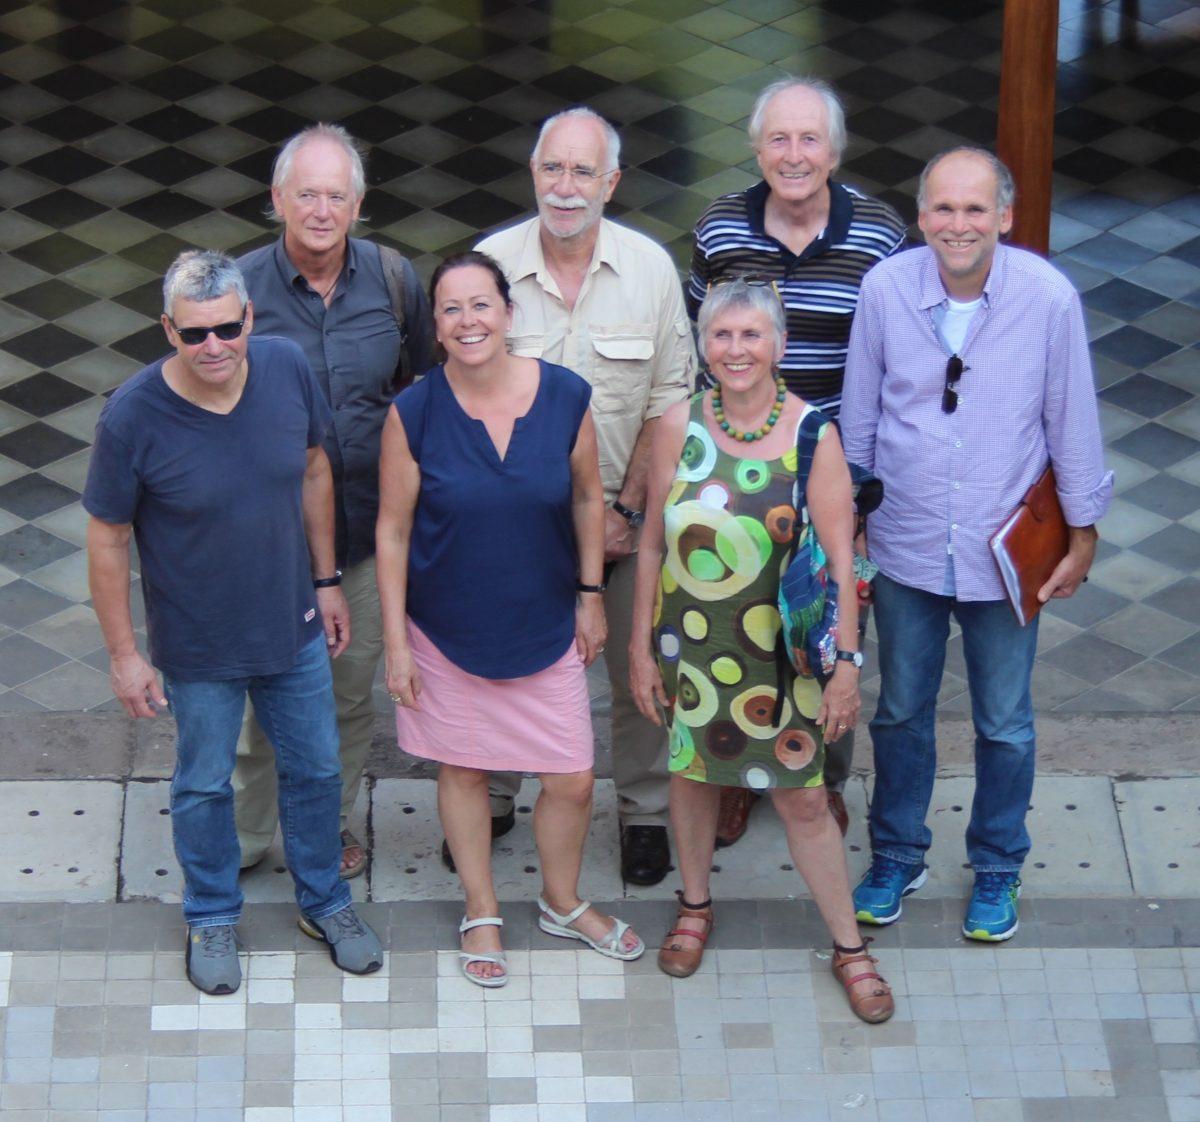 Reisebericht Nicaragua vom 13.01. bis 25.01.17